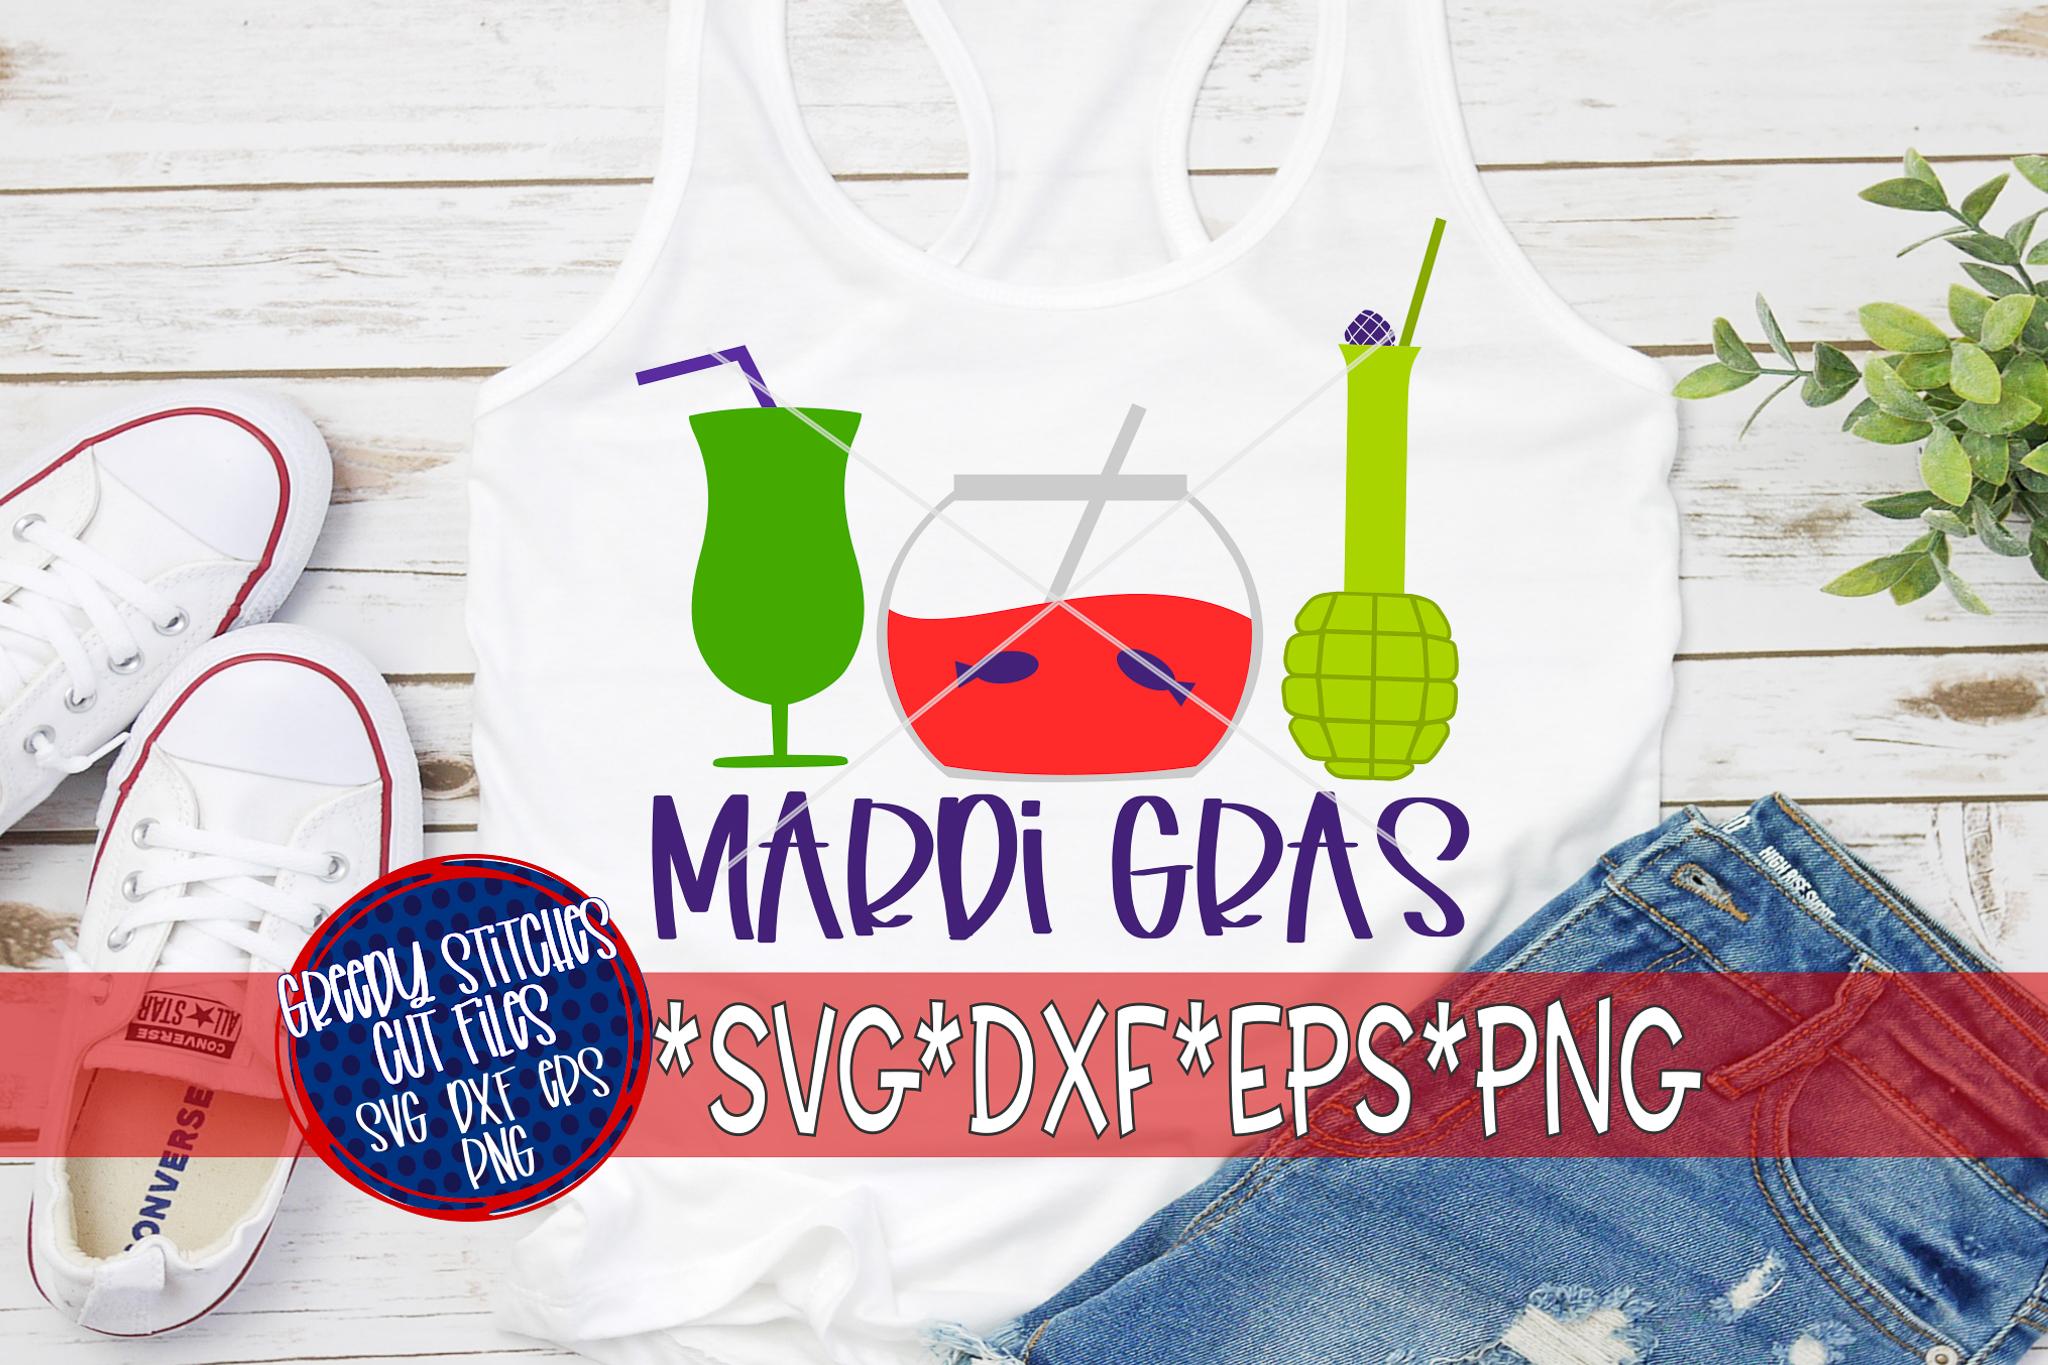 Mardi Gras |Mardi Gras Drinks SVG DXF EPS PNG example image 1